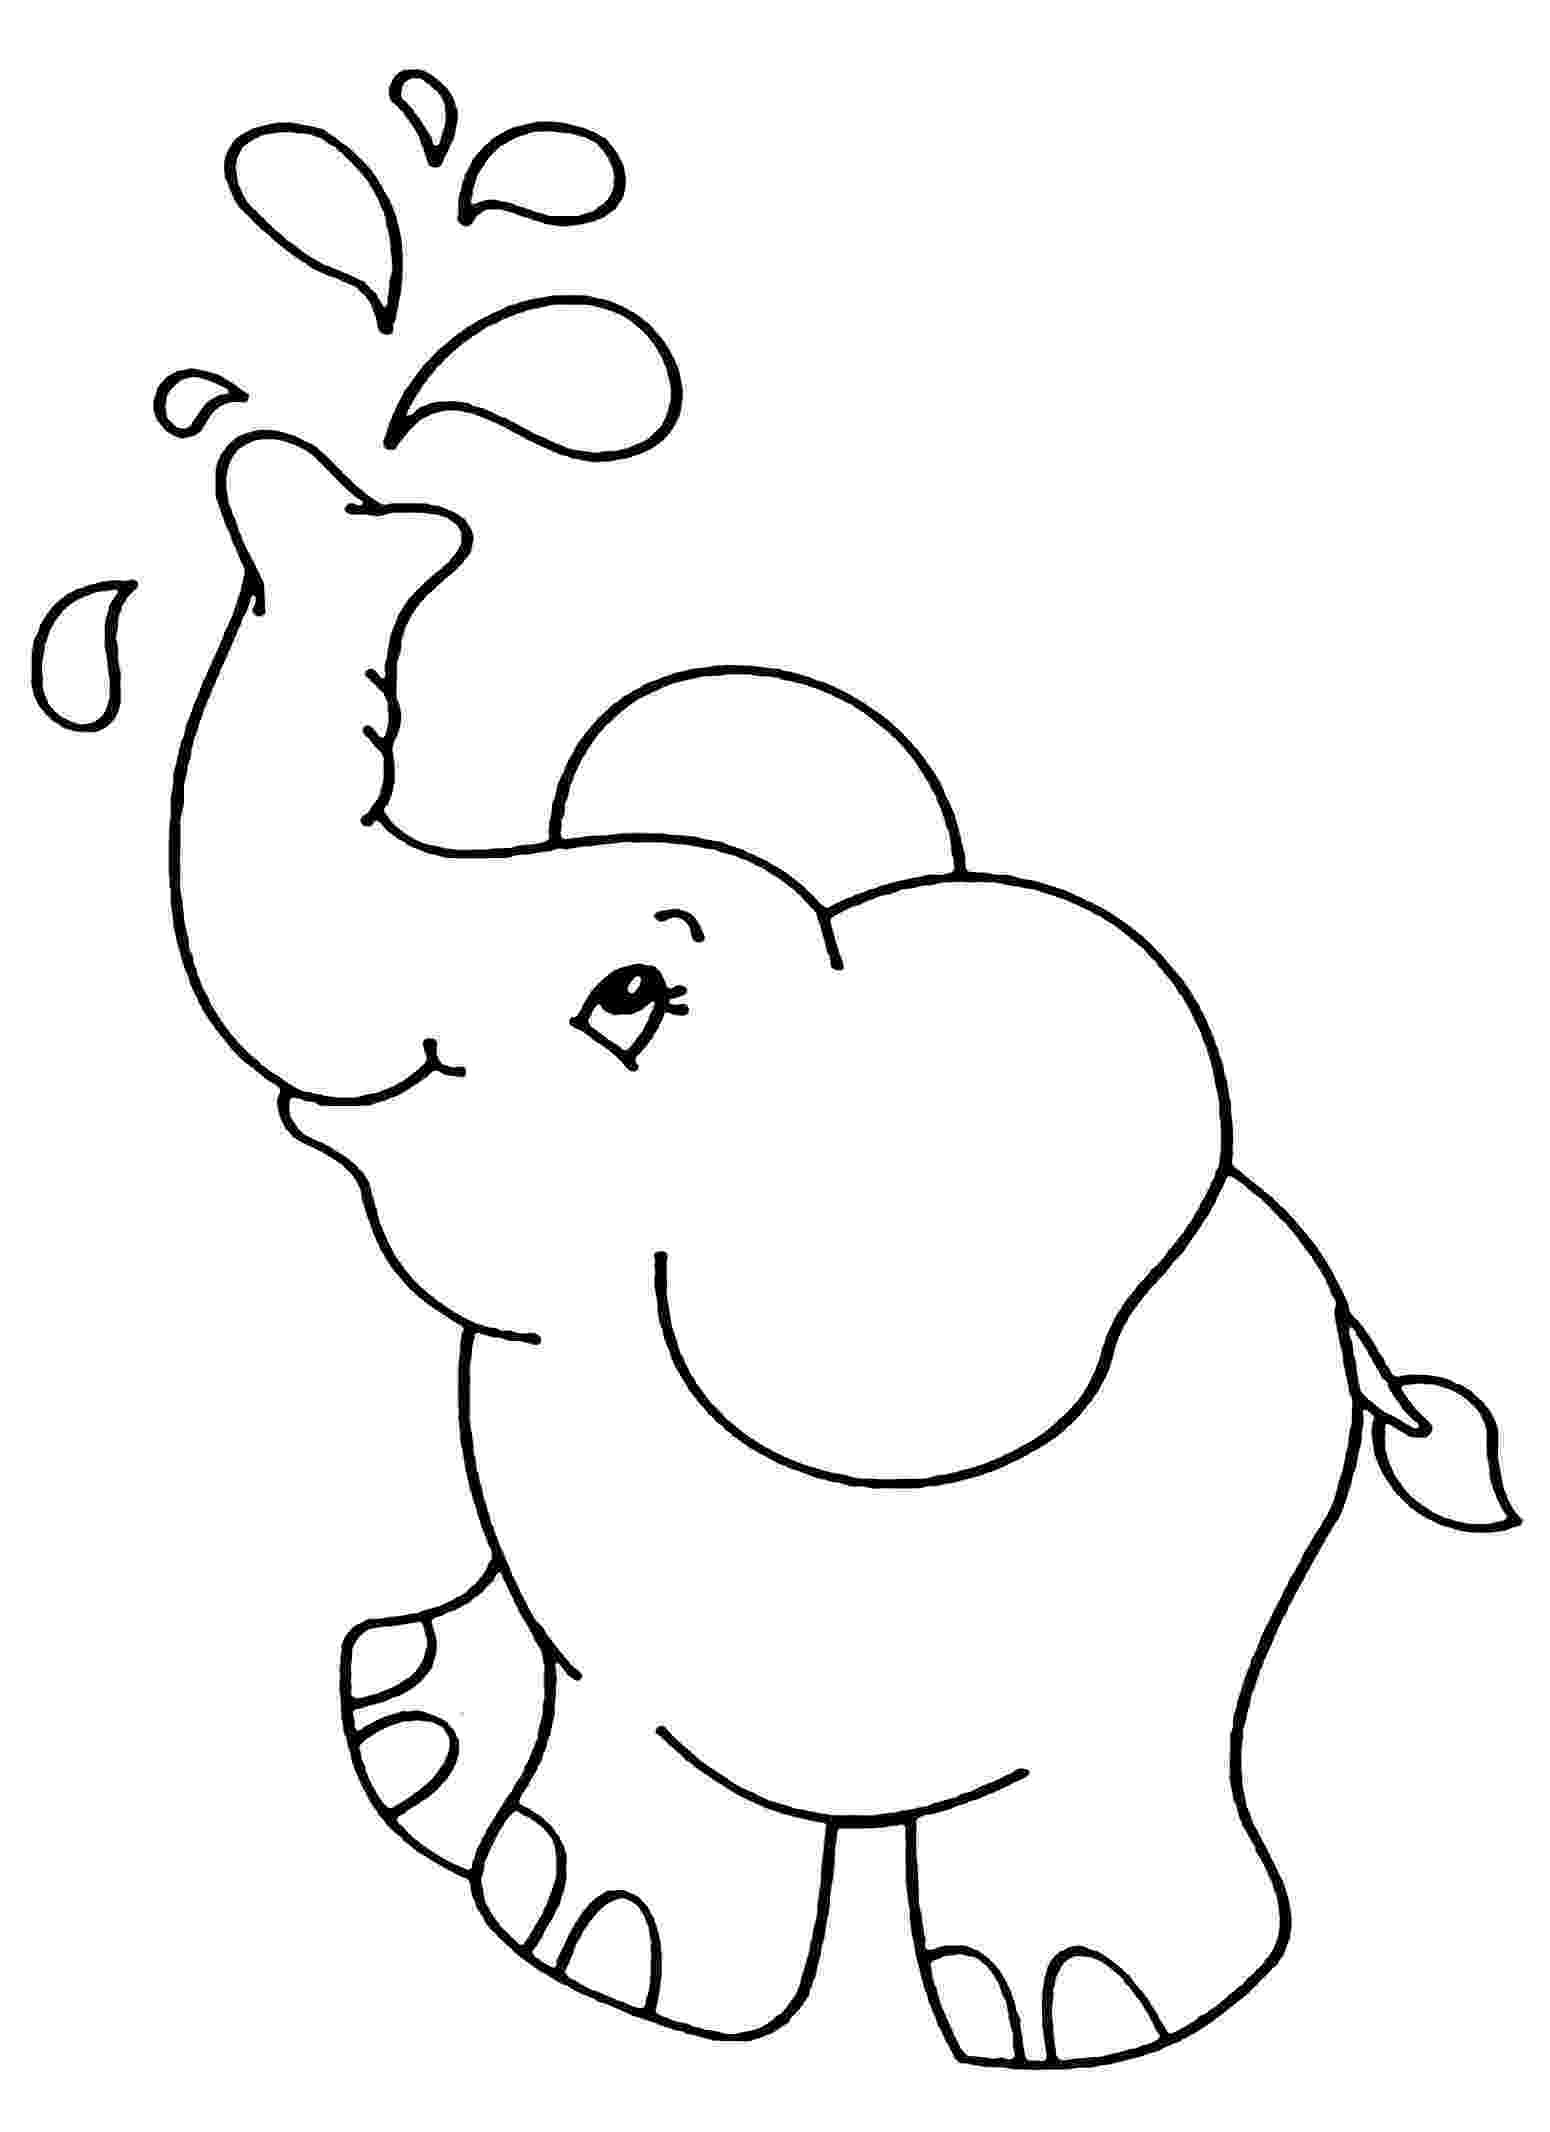 coloring pages elephants transmissionpress baby elephant coloring pages elephants pages coloring